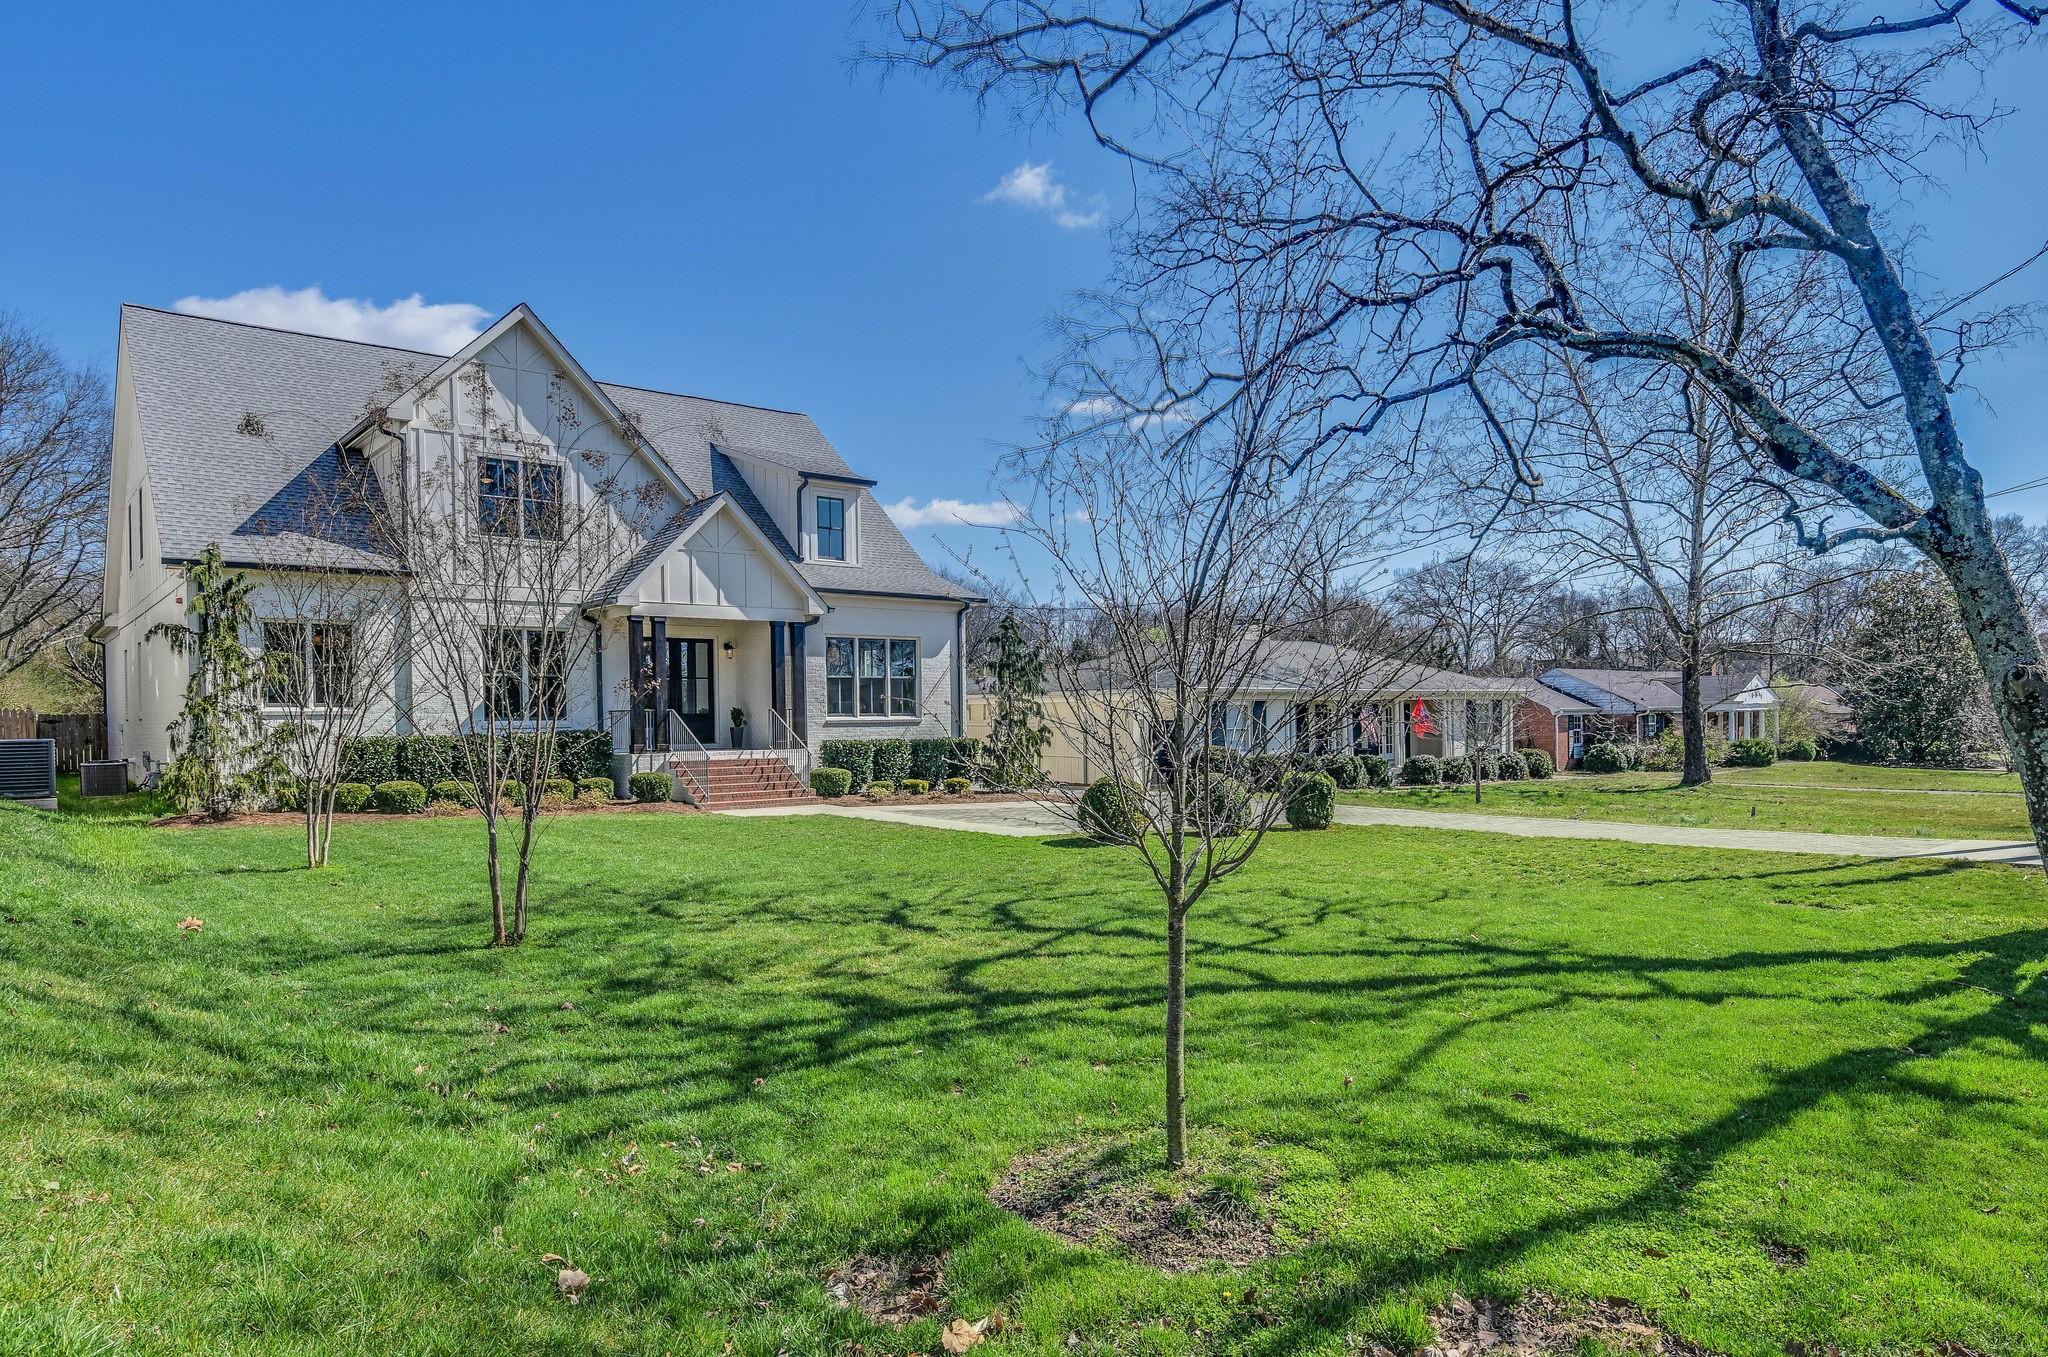 712 Estes Rd, Nashville, TN 37215 - Nashville, TN real estate listing